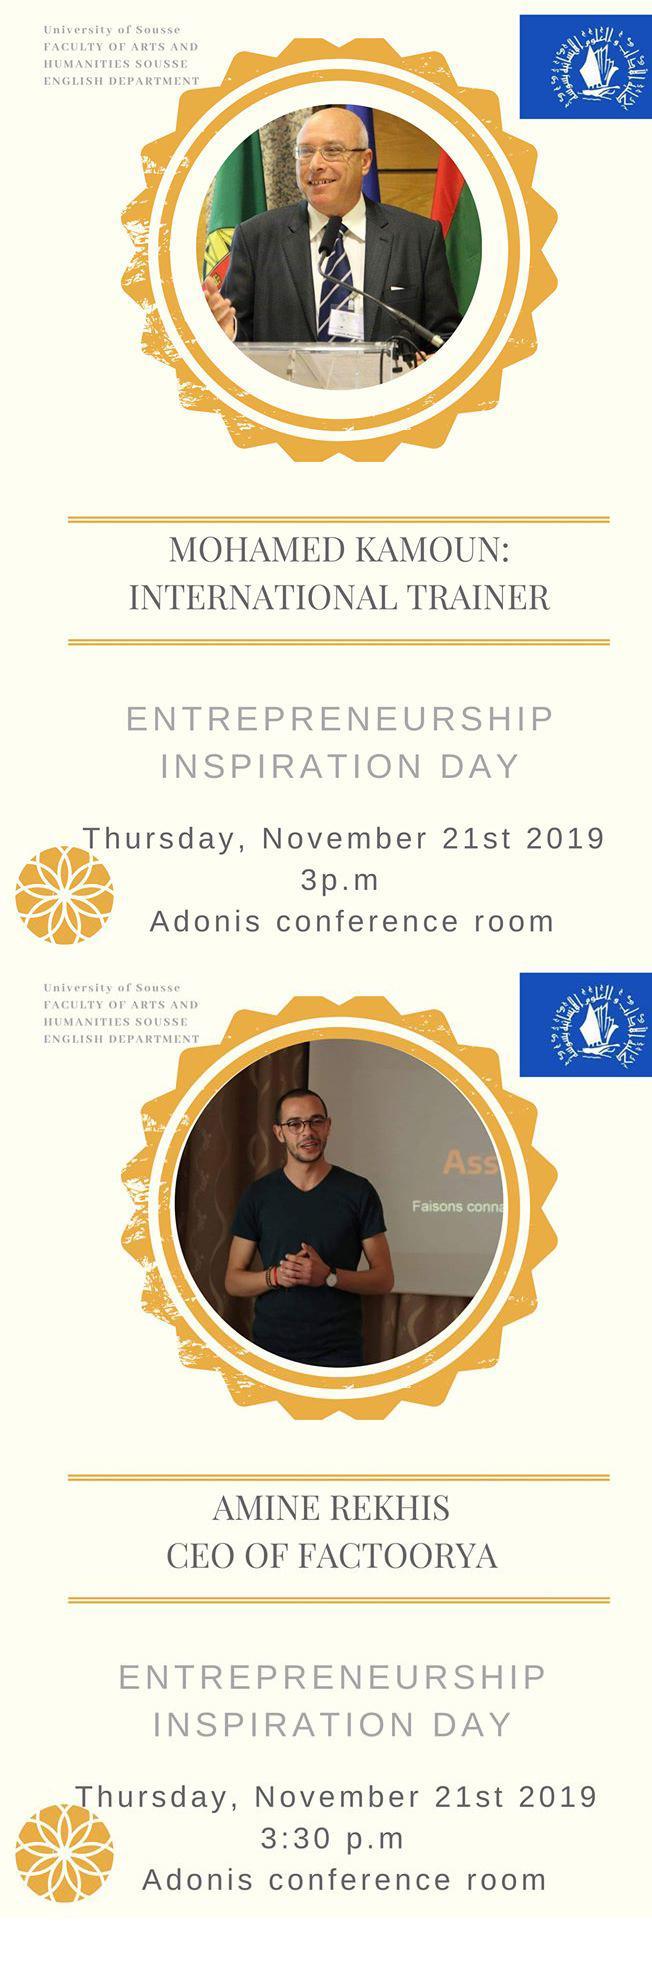 Entrepreneurship Inspiration Day